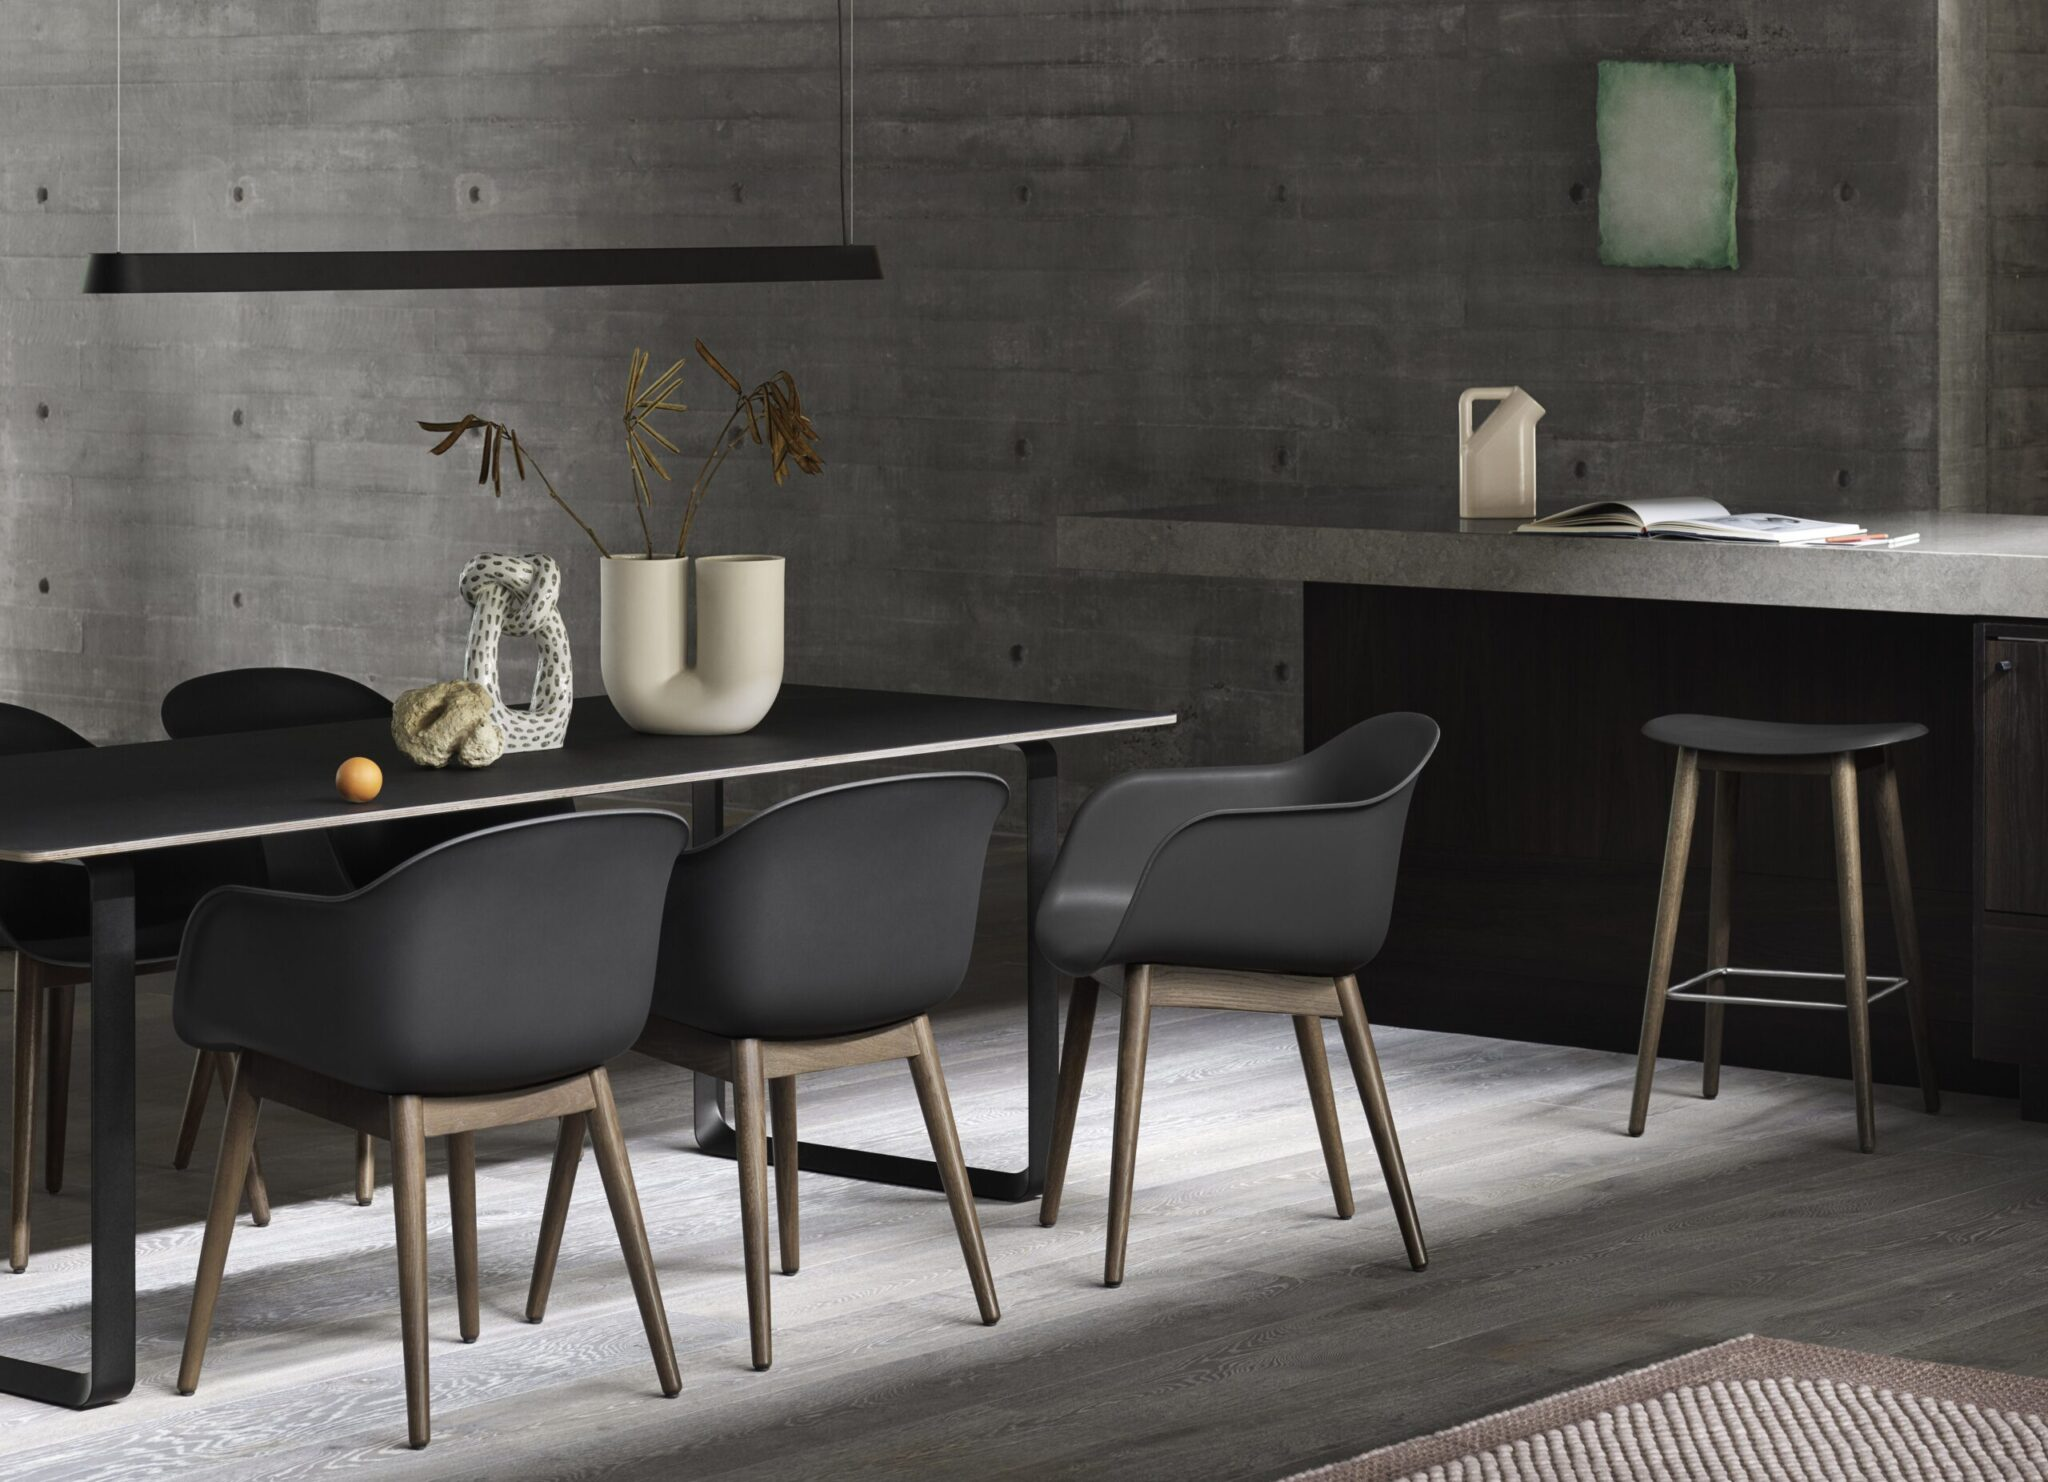 Linear-pendant-lamp-169-black-70-70-black-fiber-armchair-fiber-counter-stool-black-stained-dark-brown-V2-muuto-med-res-scaled